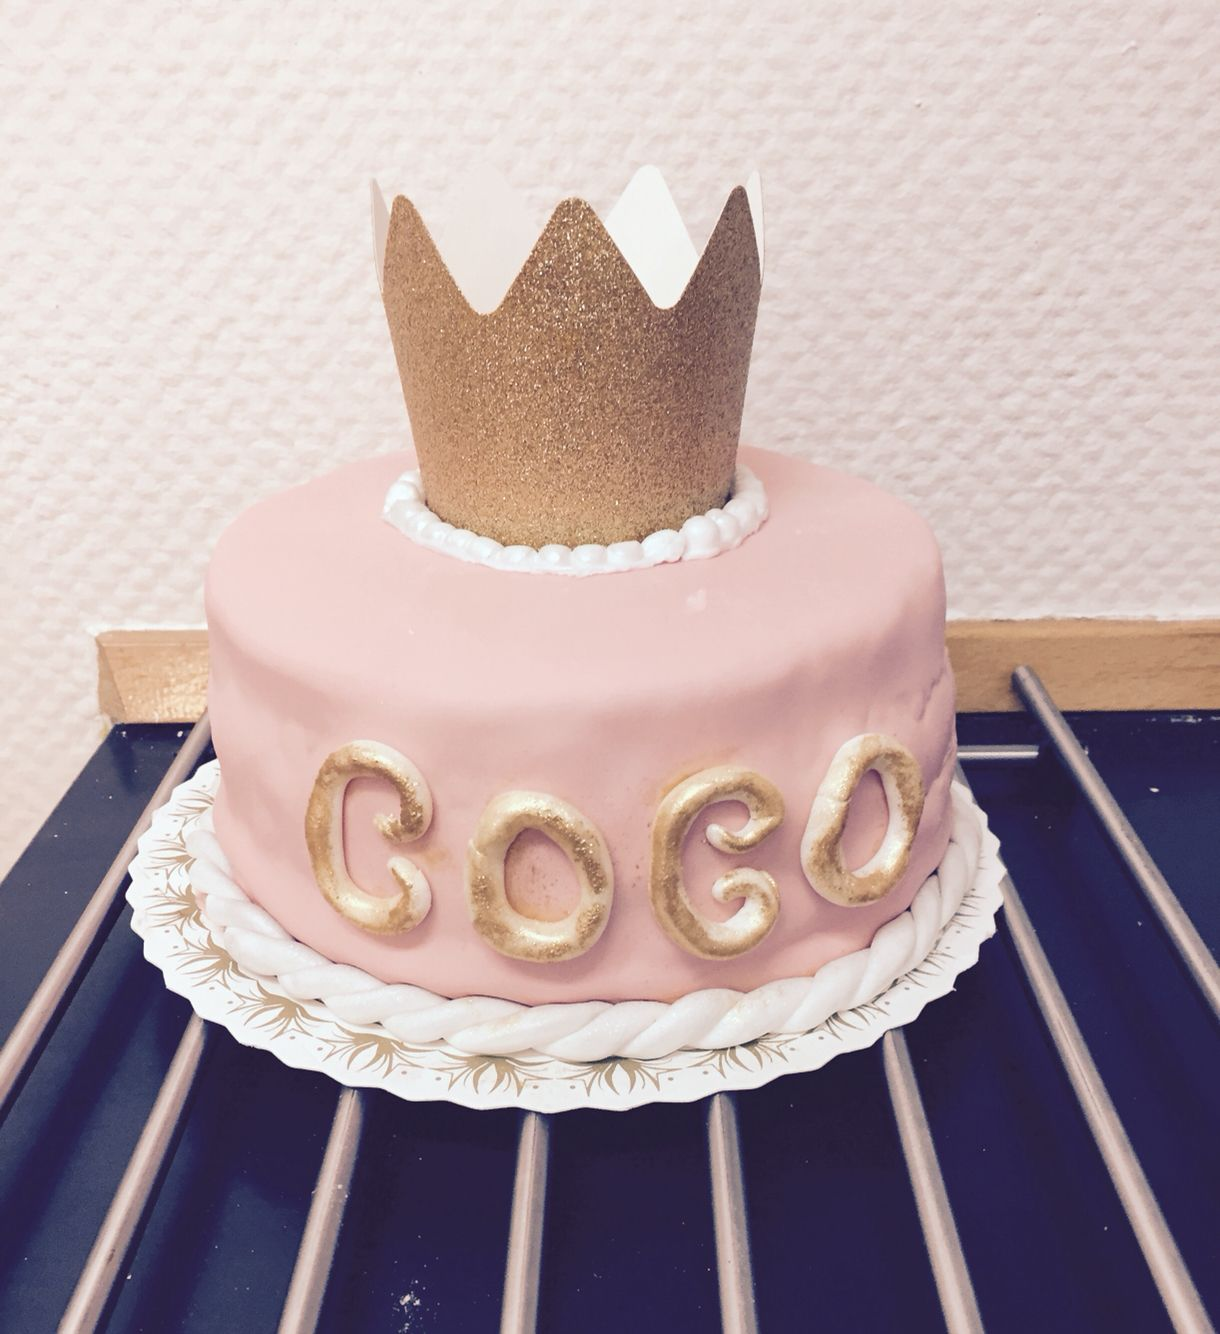 Cocos prinsesse kage